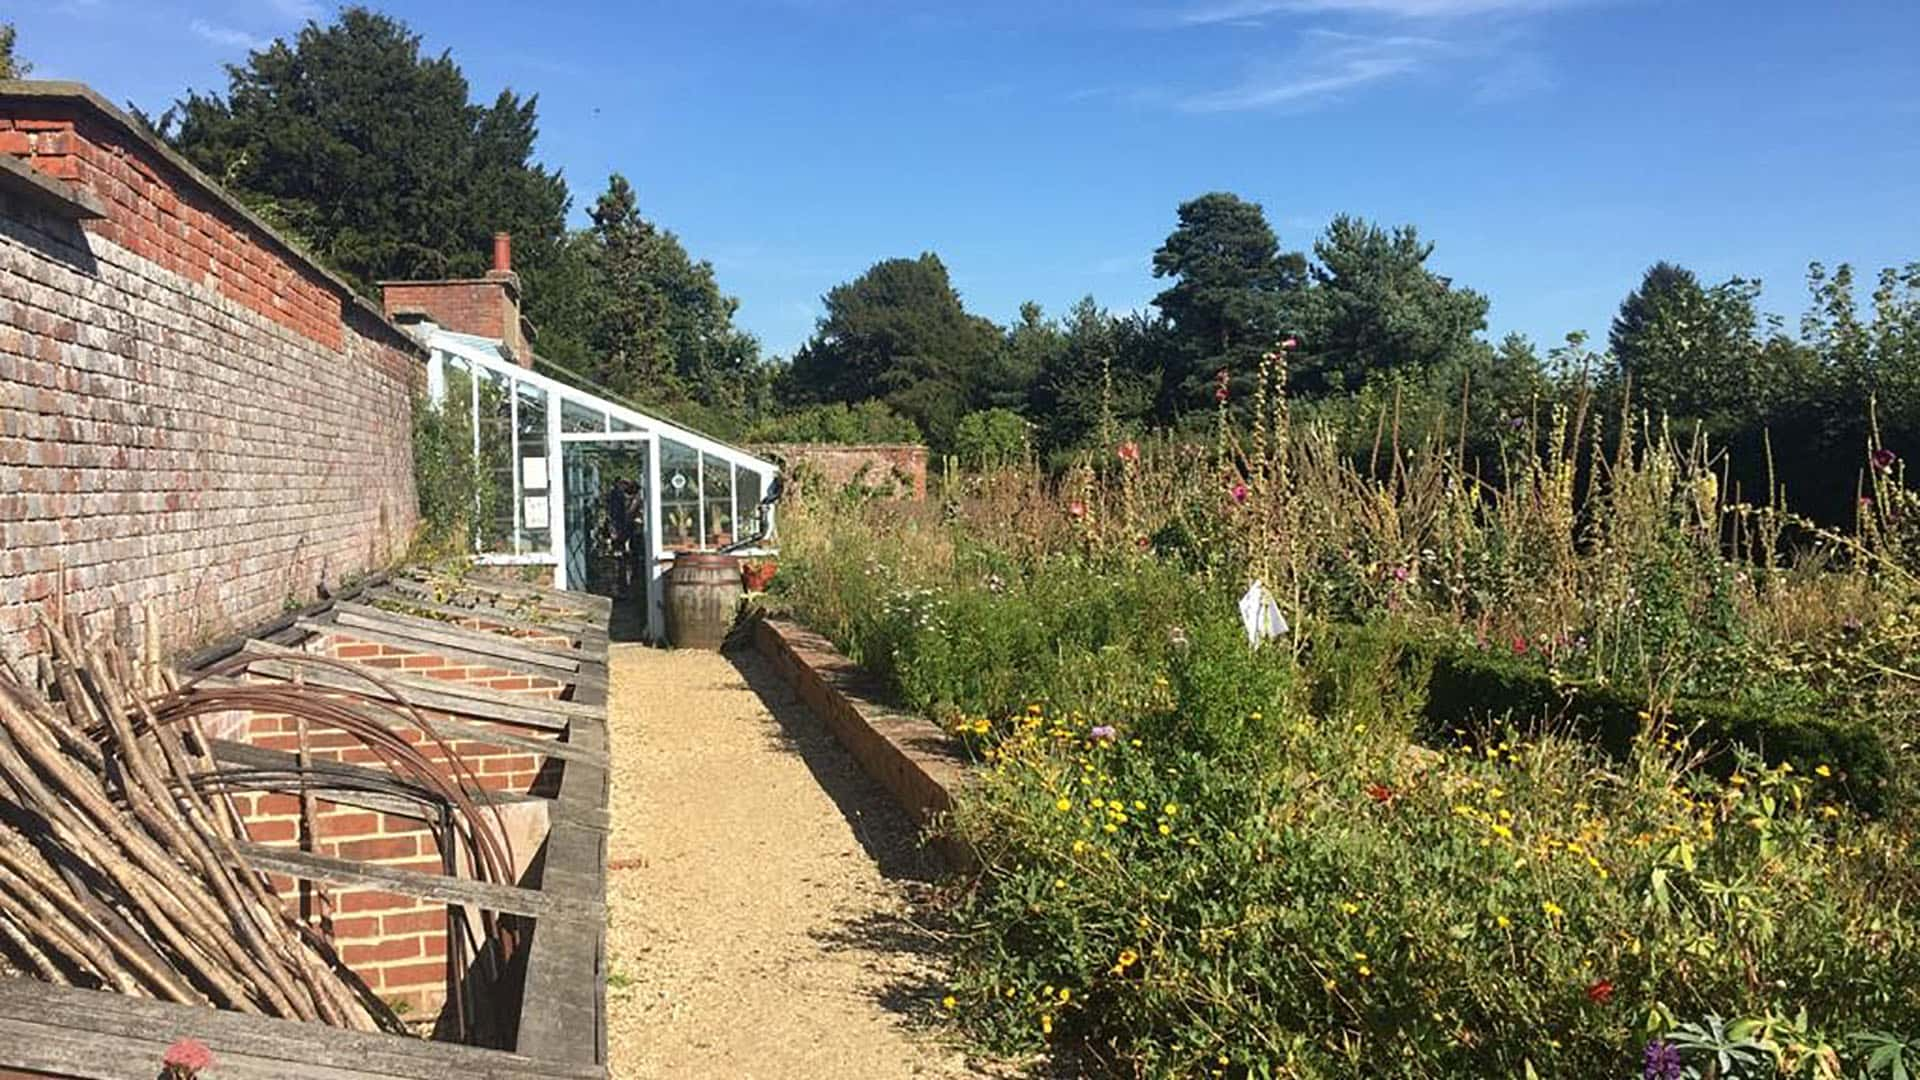 Charles Darwin's garden at Down House